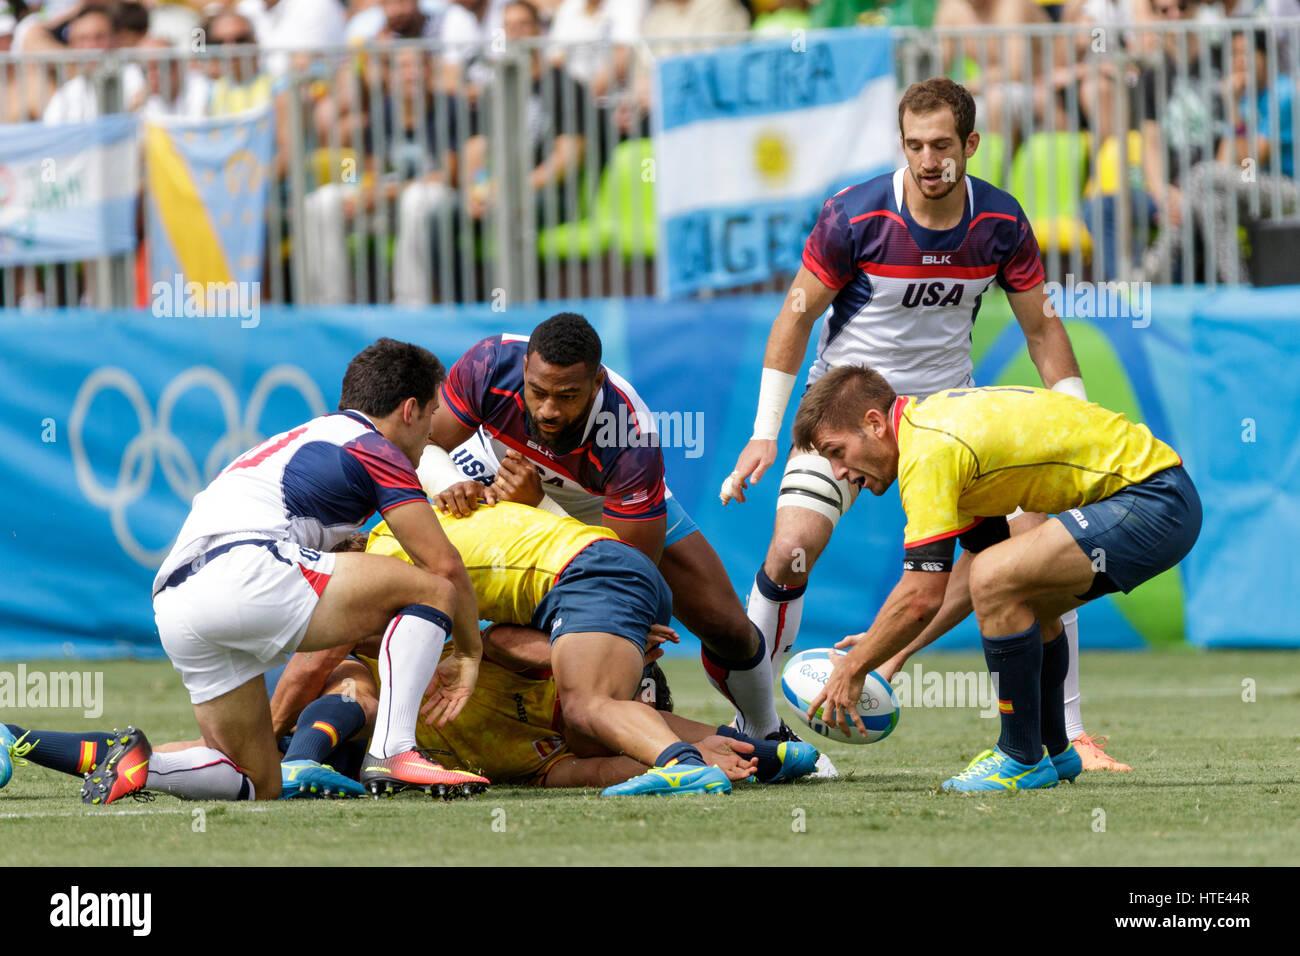 Esp rugby